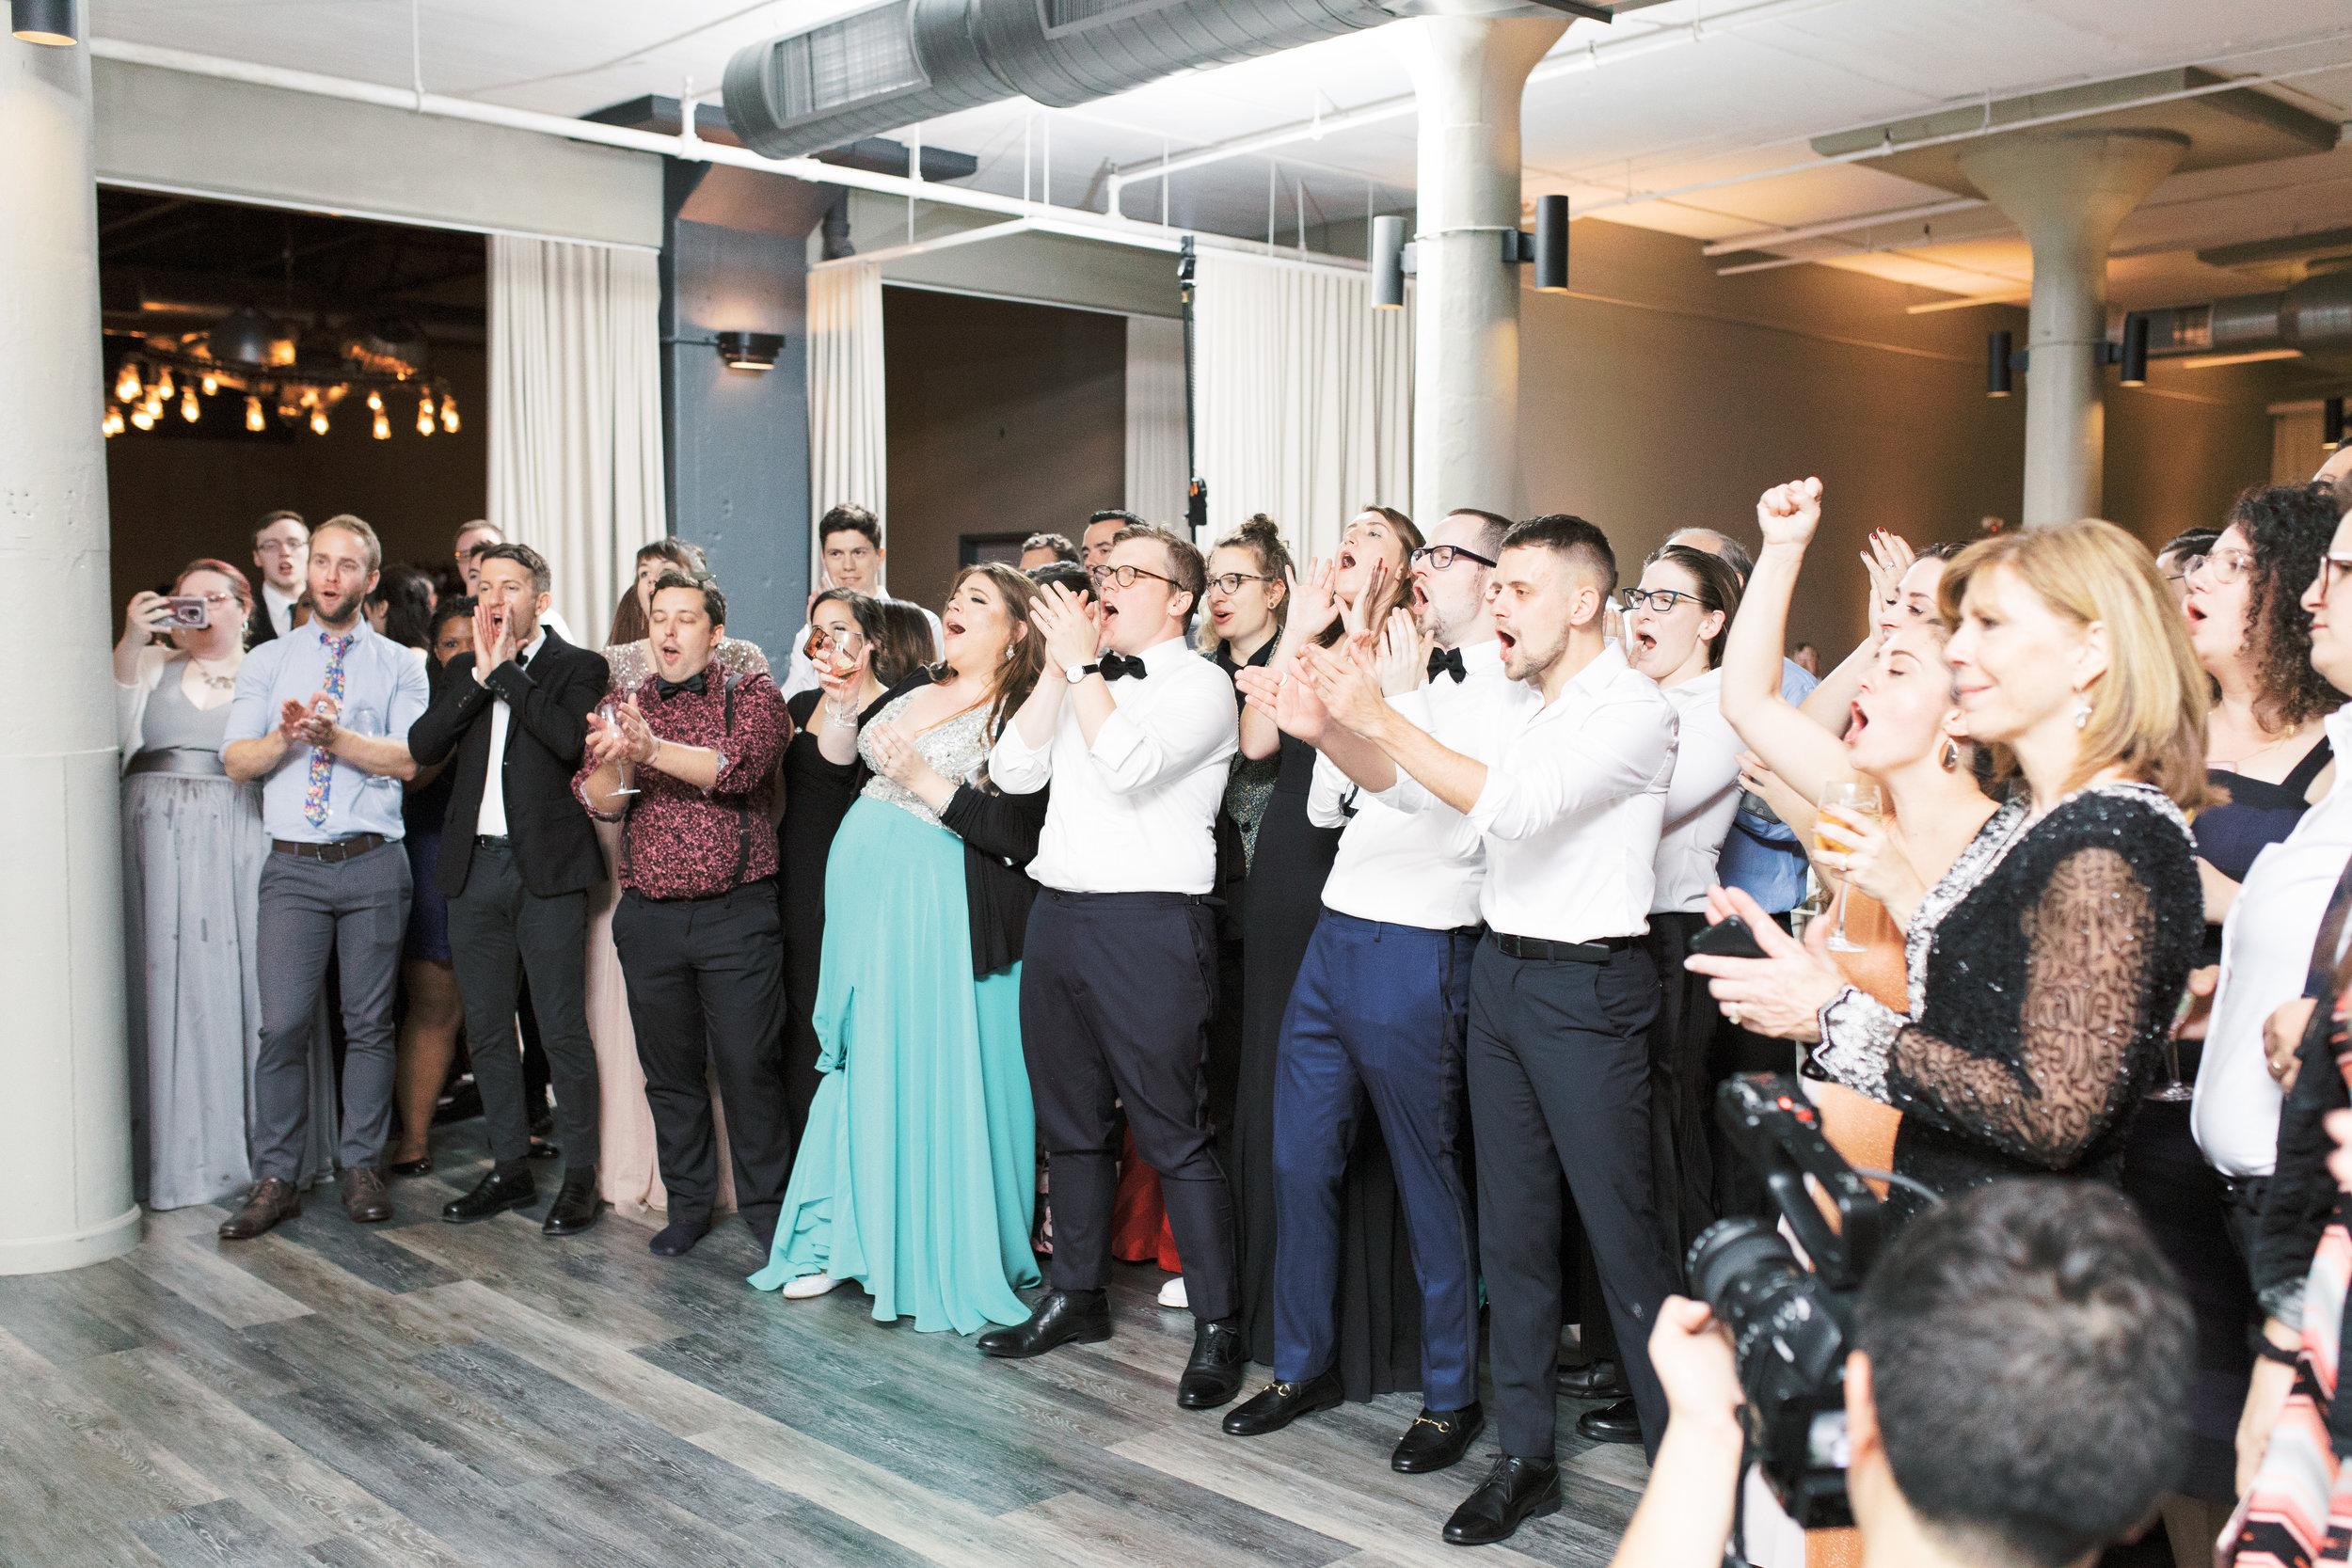 haley-richter-photography-keristin-wedding-philadelphia-fame-same-sex-grooms-classic-fun-drag-show-144.jpg